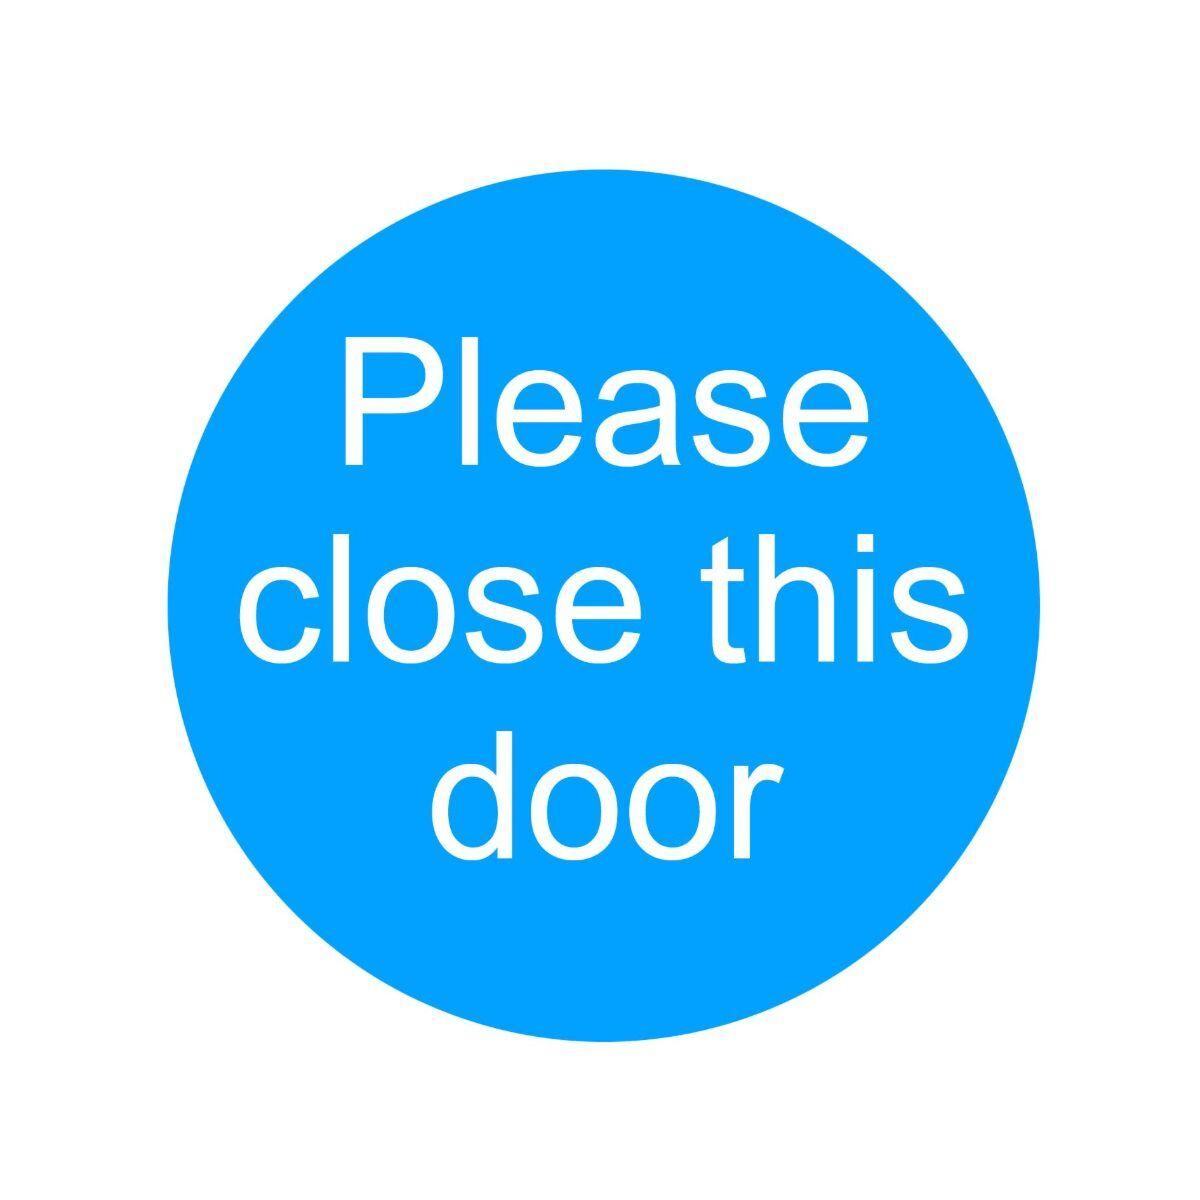 PVC Sign Please Close This Door 100x100mm